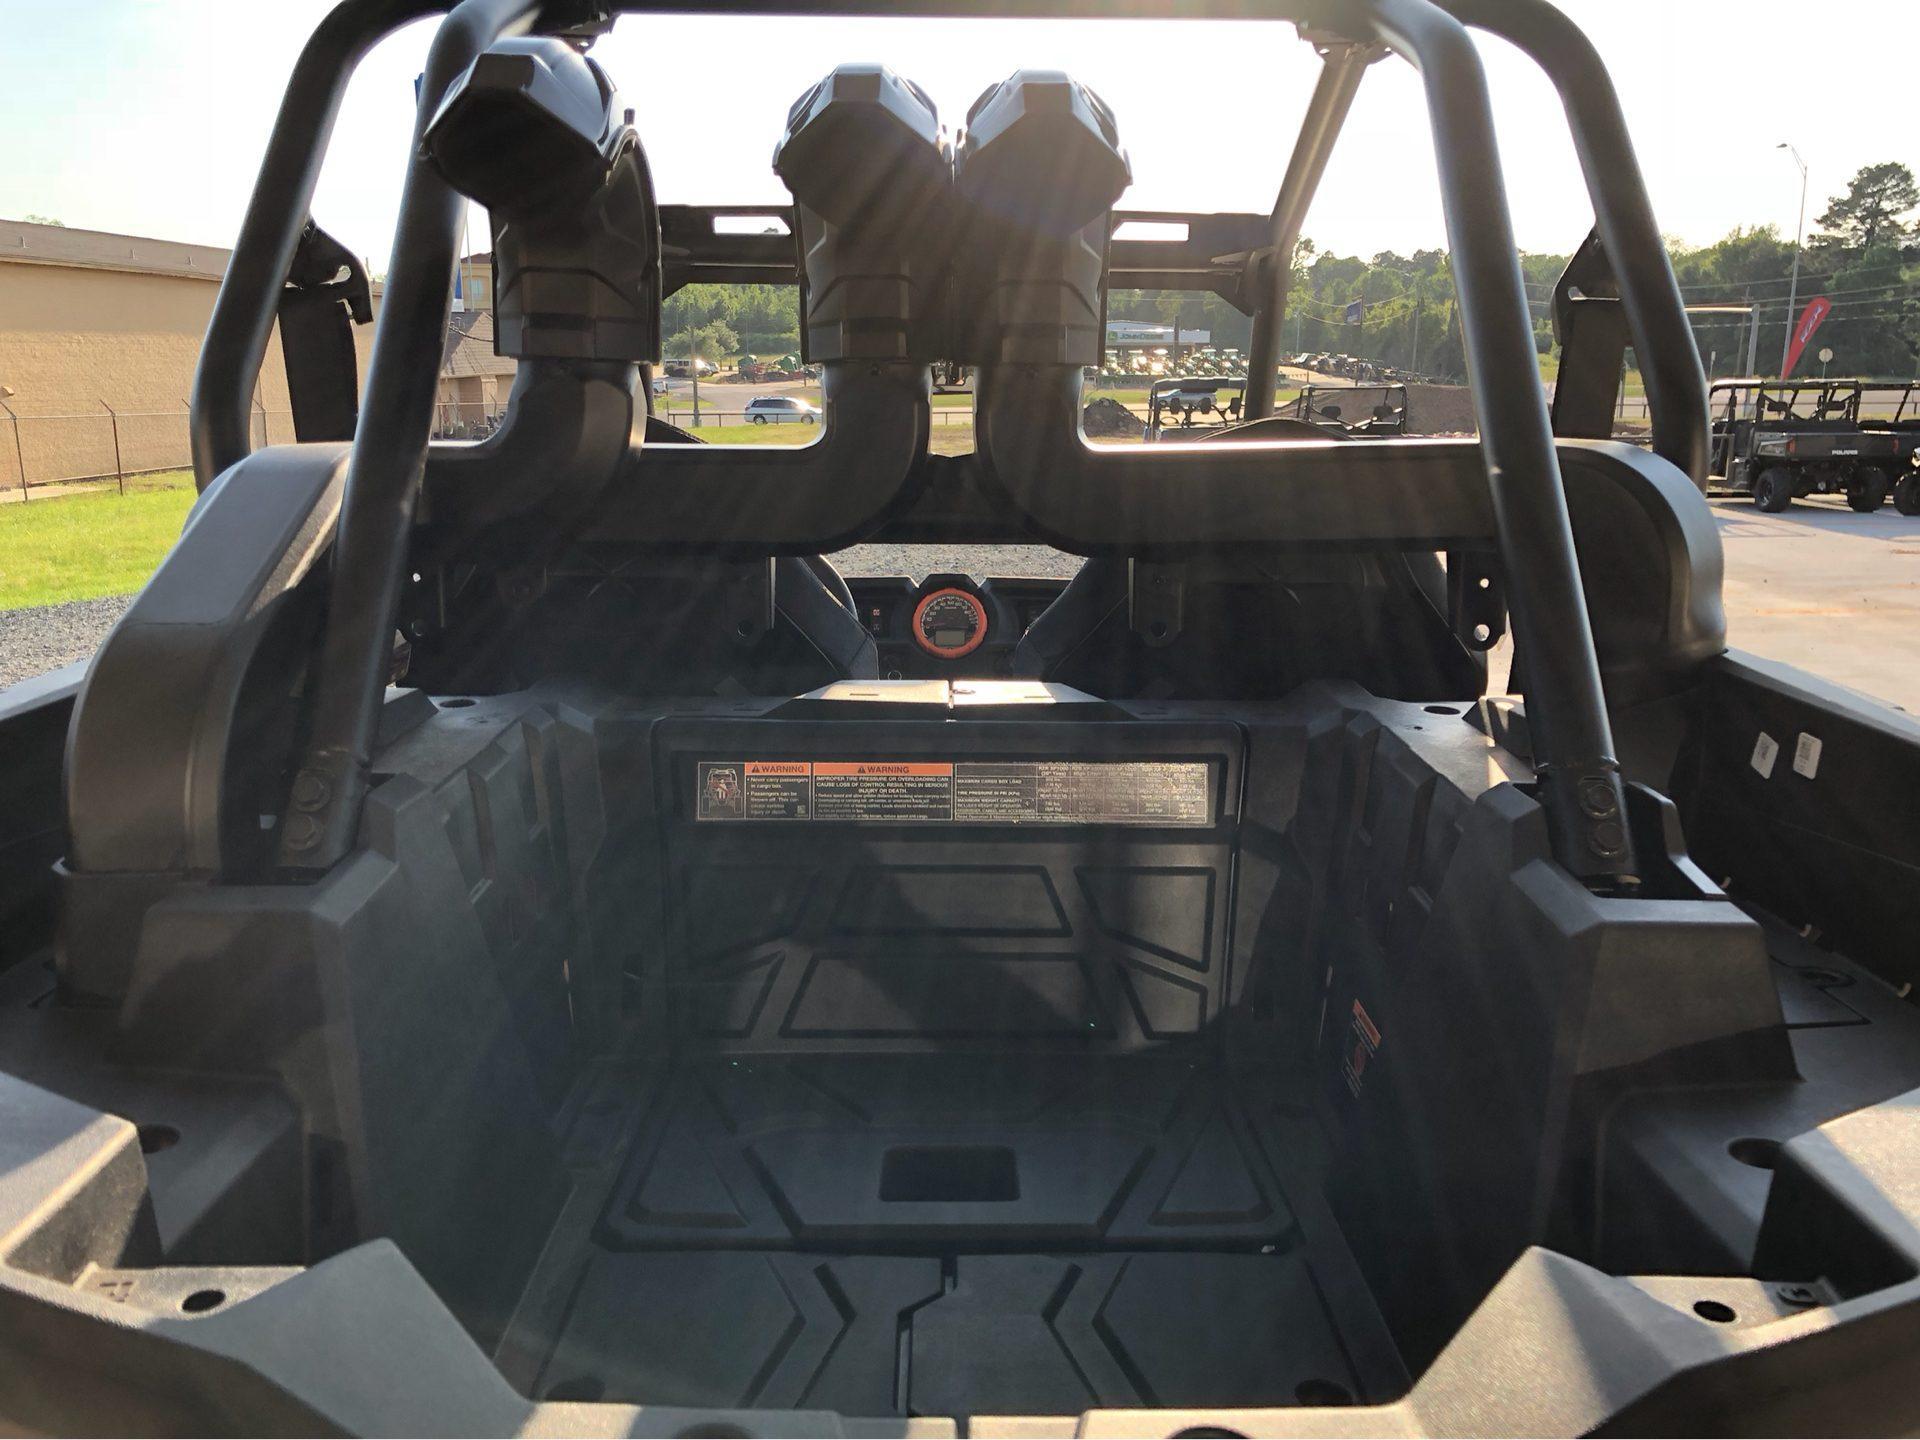 2018 Polaris RZR XP 1000 EPS High Lifter Edition 5